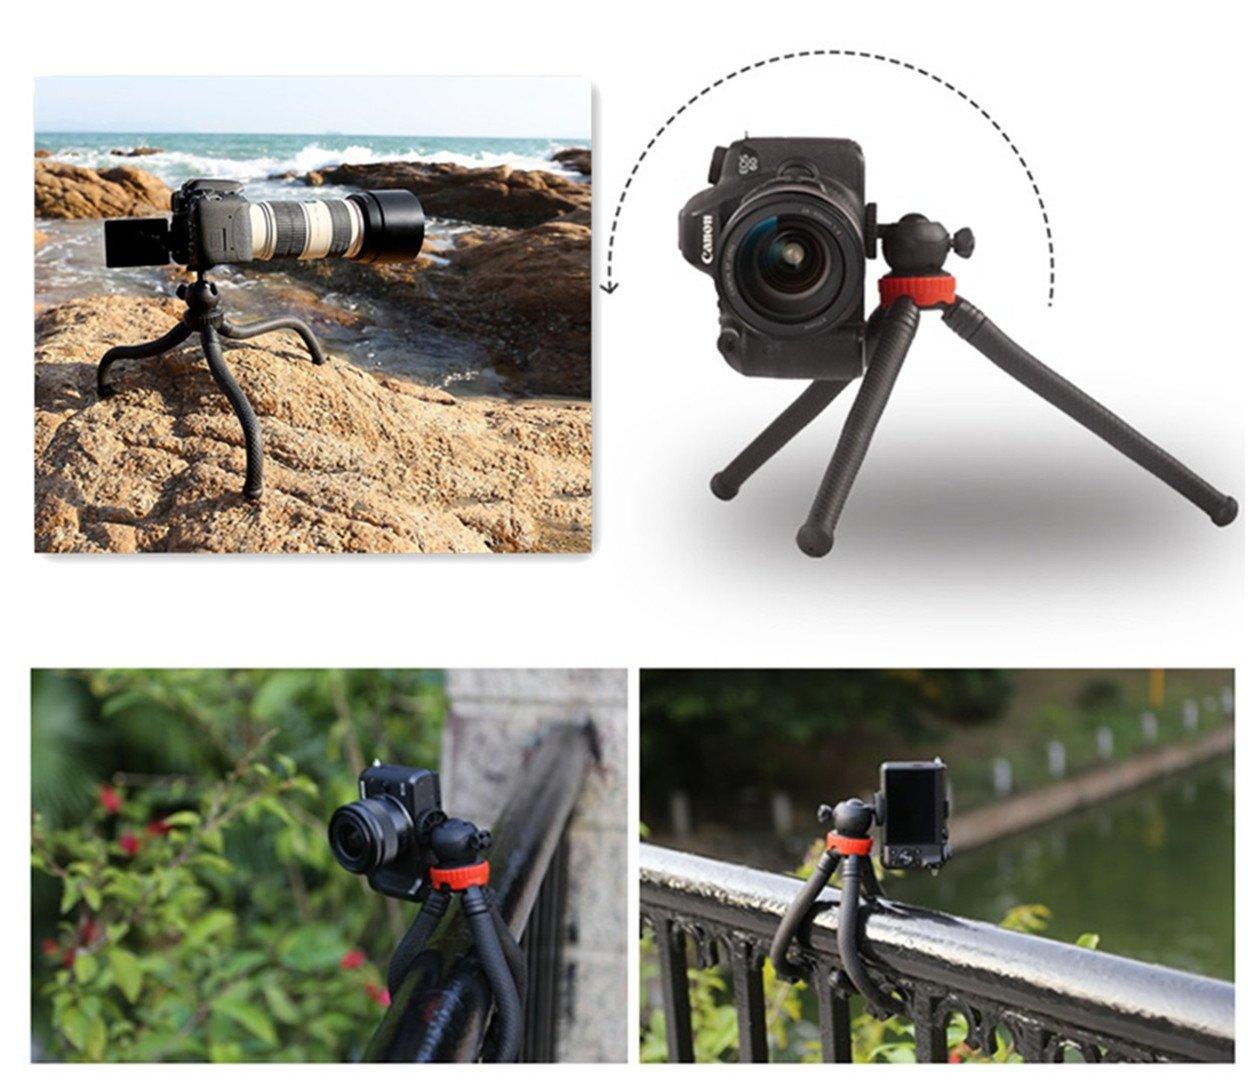 Premium Phone Camera Tripod, Wonsain 12'' Flexible Mini Travel Tripod Stand  with Bluetooth Remote Control for GoPro/Canon/Nikon/Sony DSLR/Cellphone